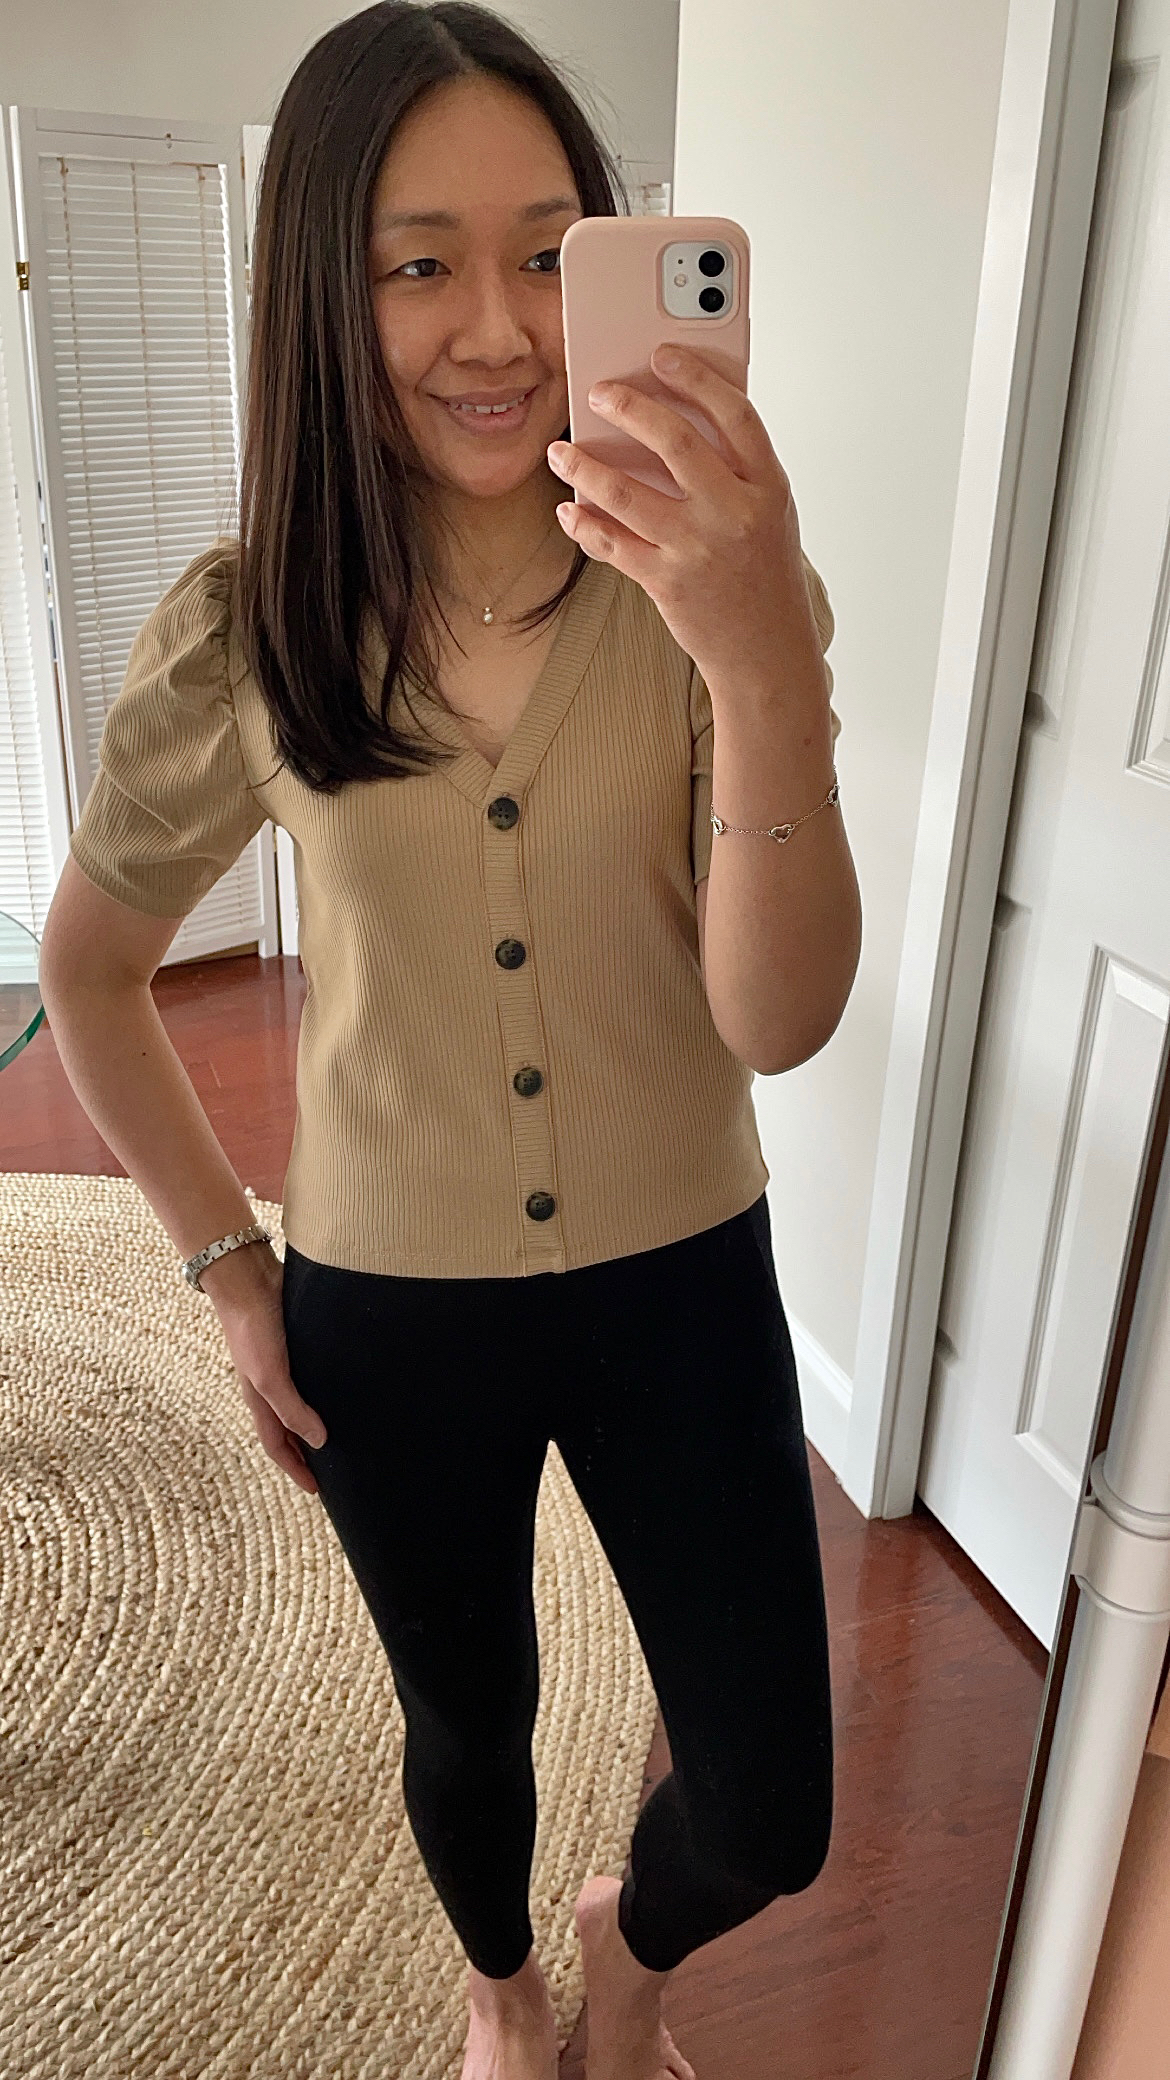 LOFT Ribbed Puff Sleeve Cardigan Top, size S regular